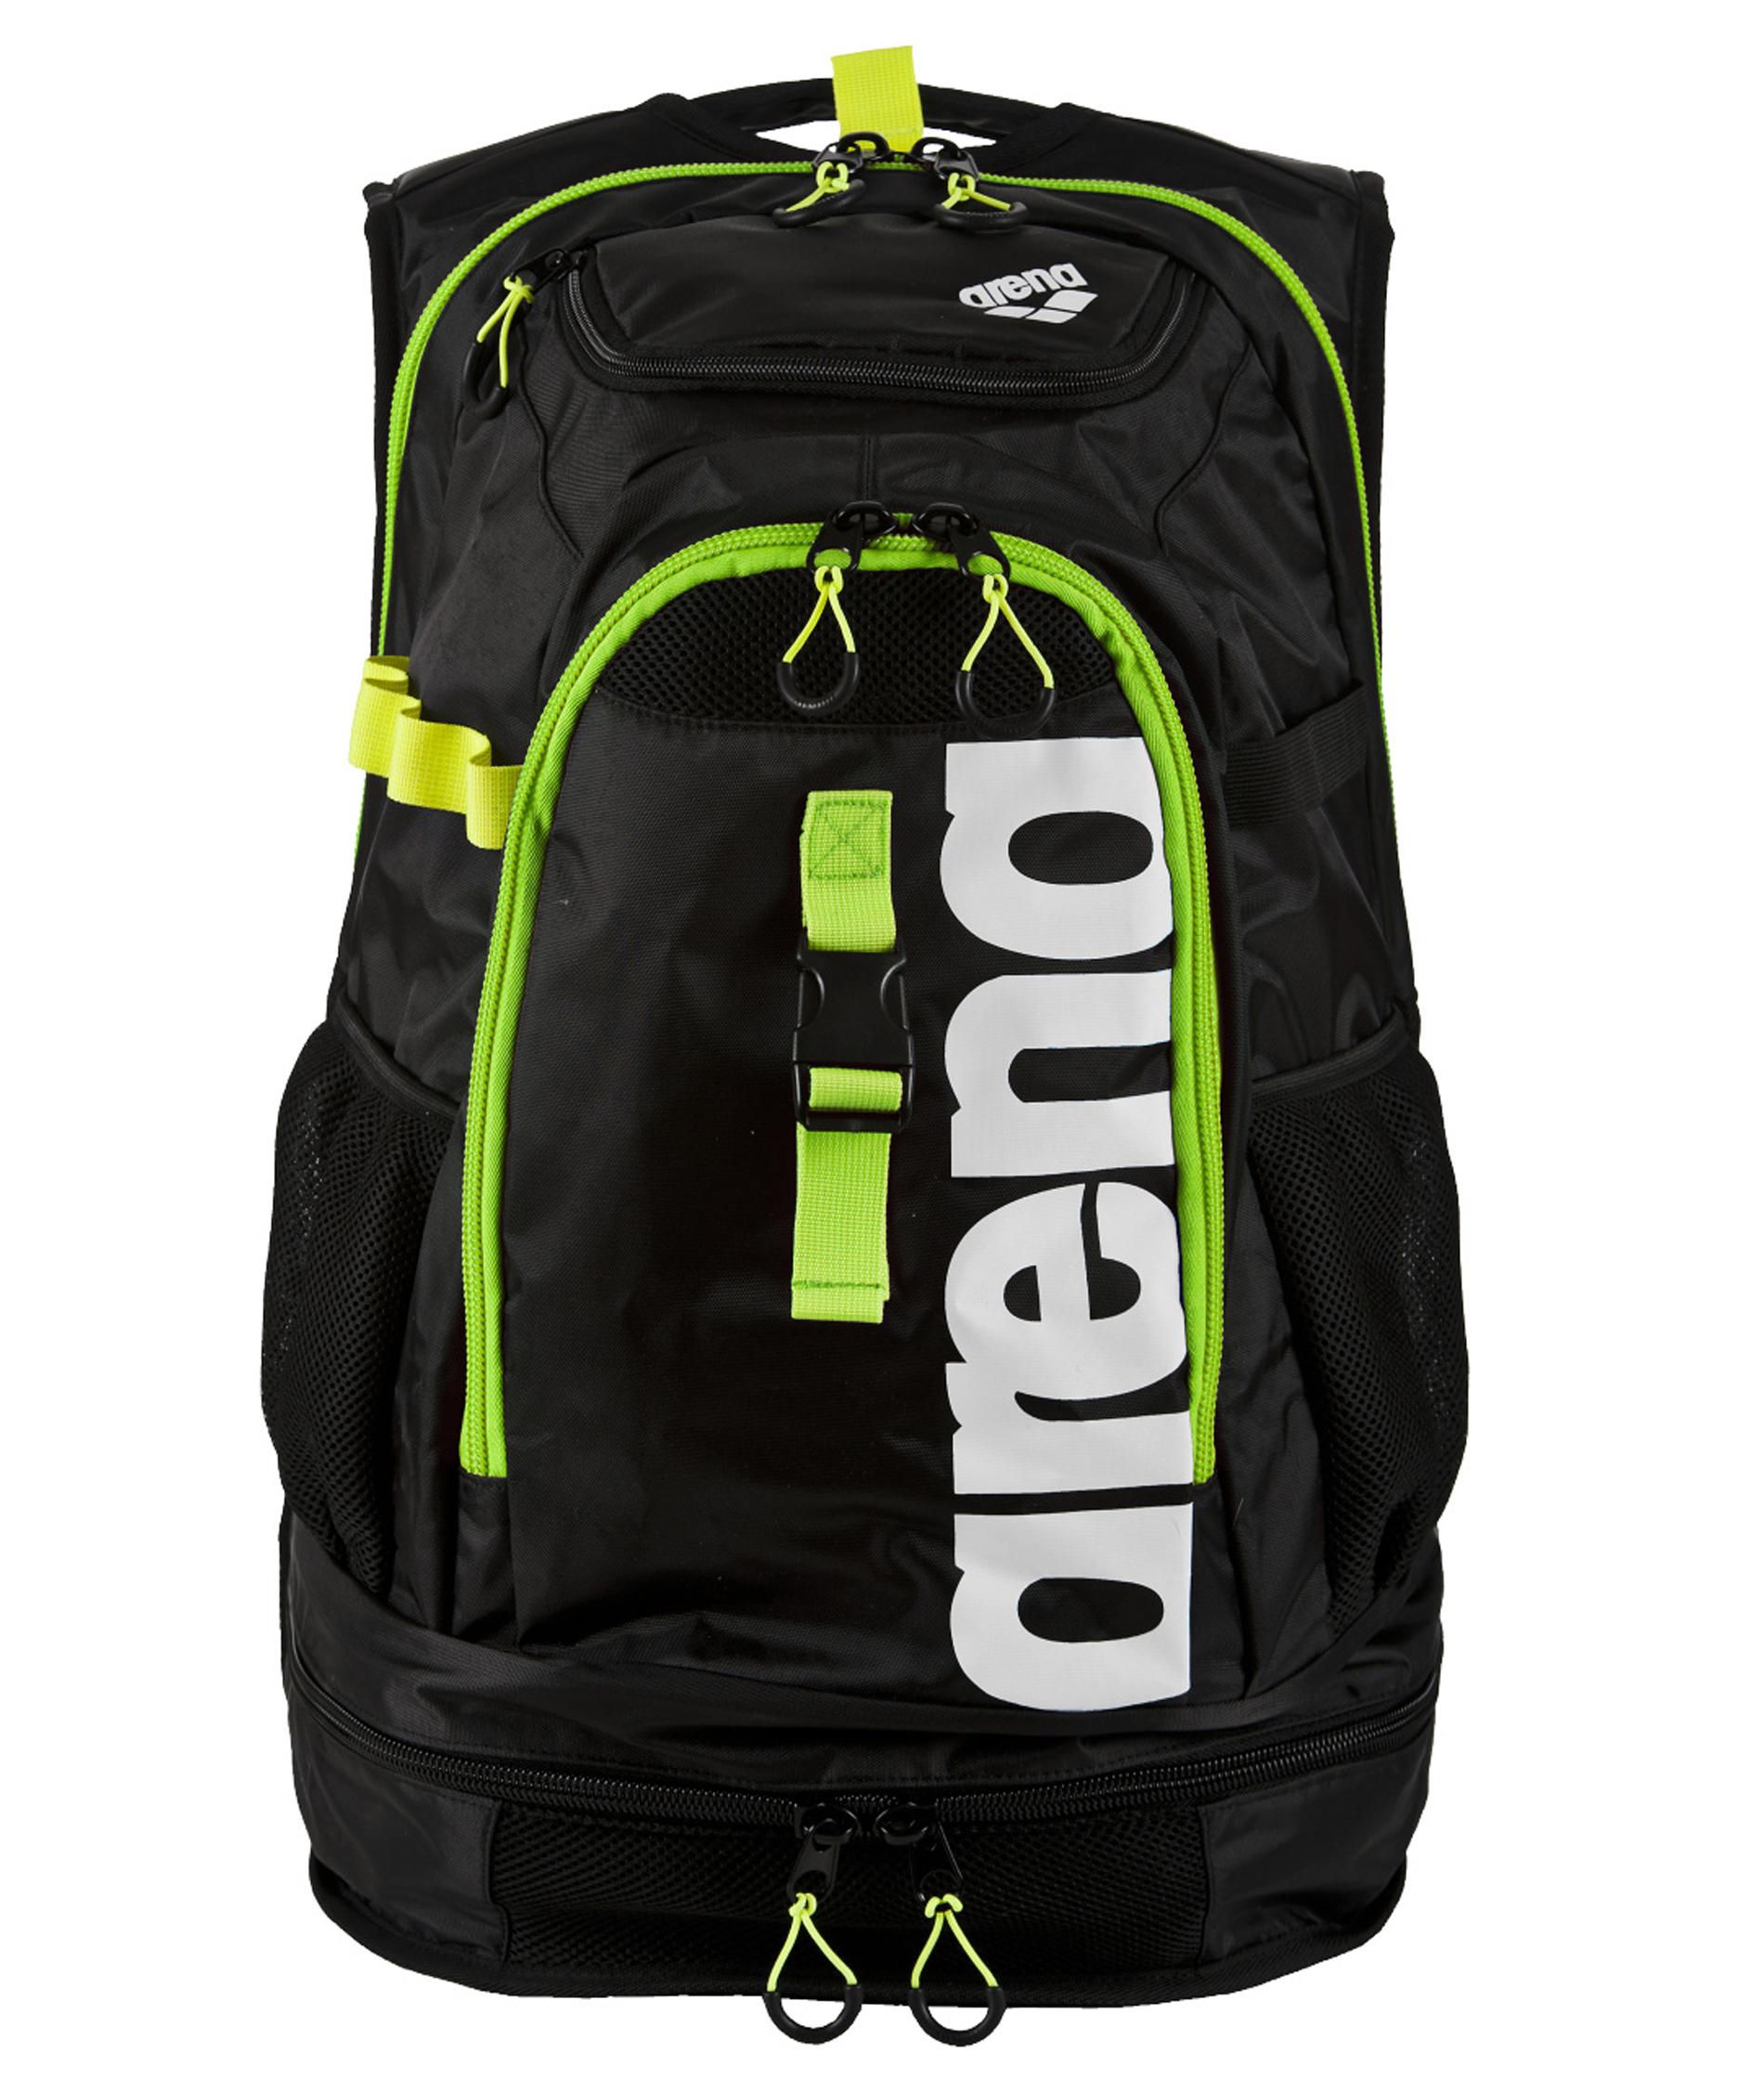 Arena Fastpack 2.1 Backpack - Black/Flou Yellow